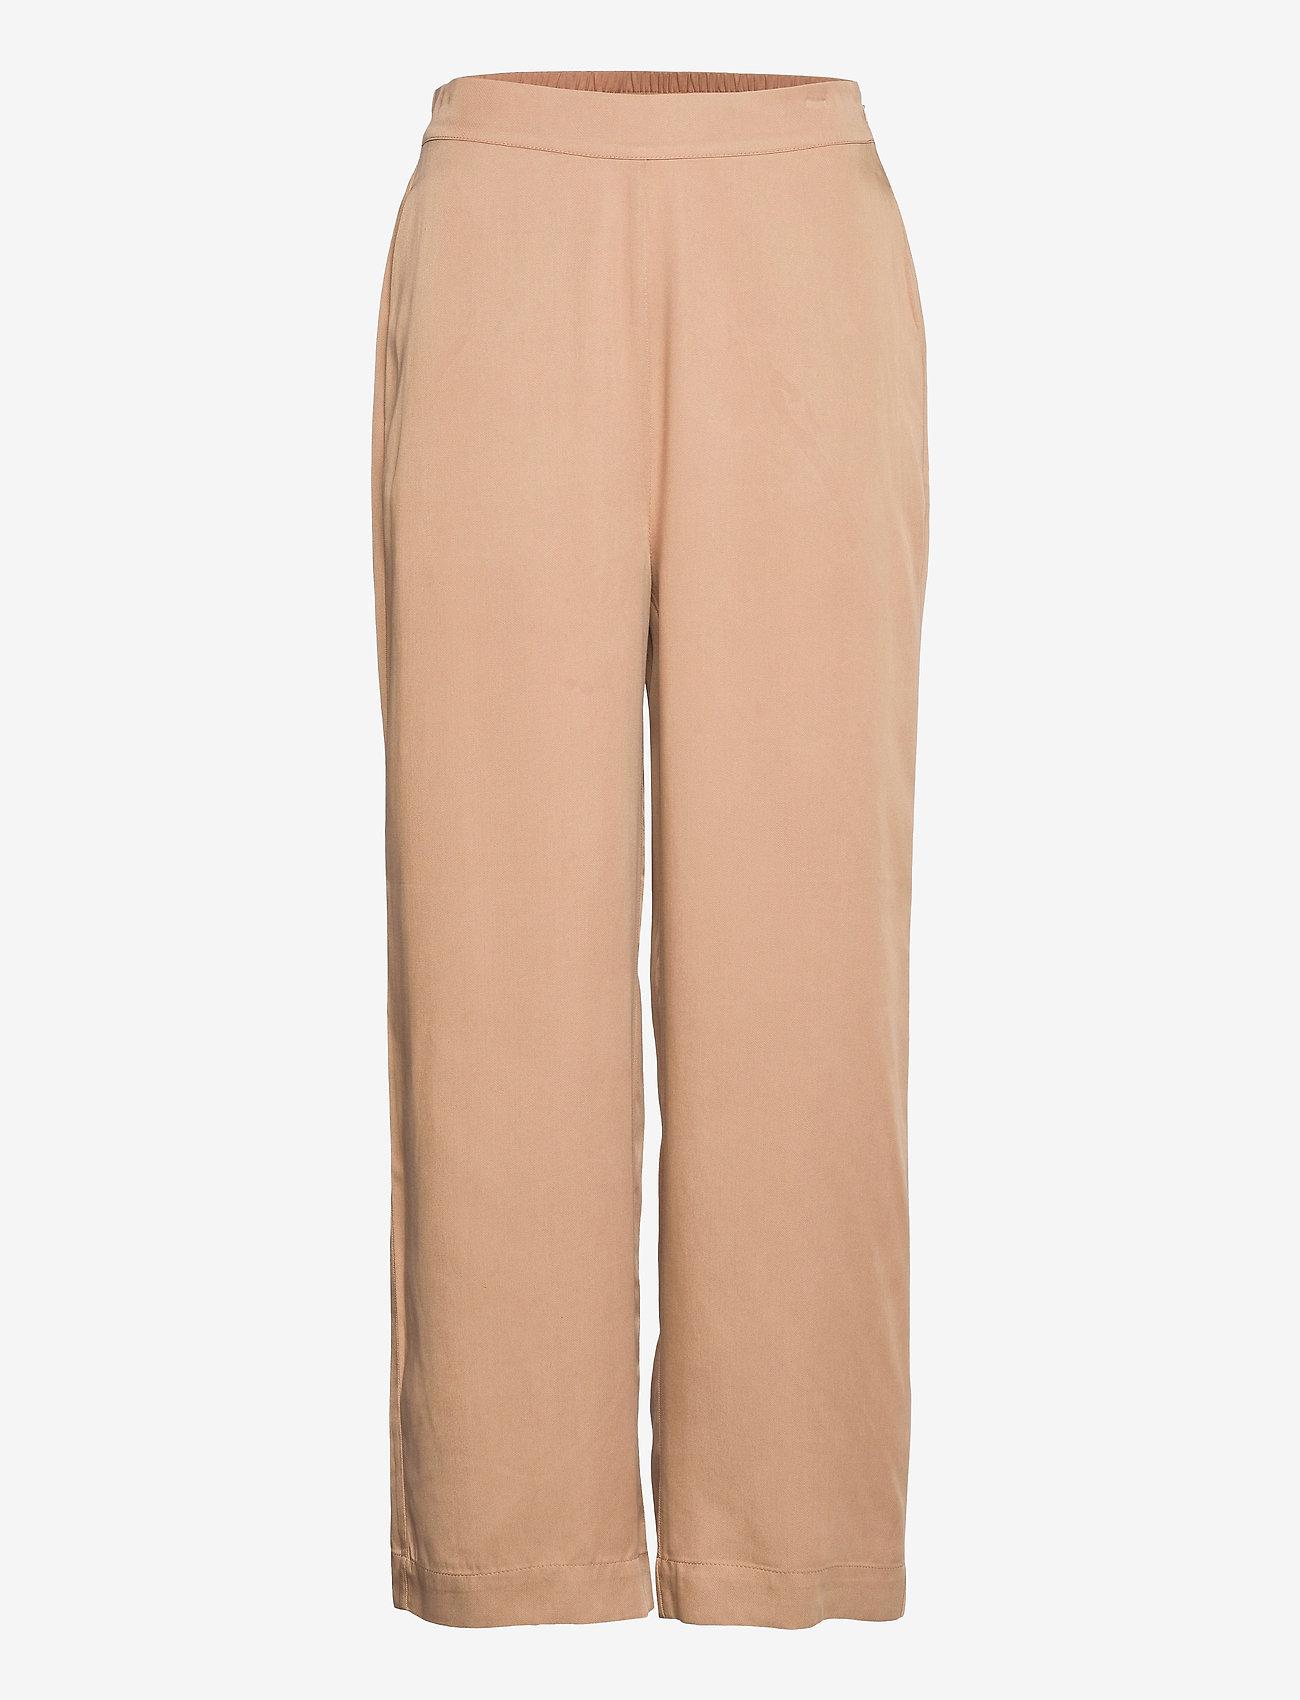 NORR - Jade pants - bukser med brede ben - beige - 0